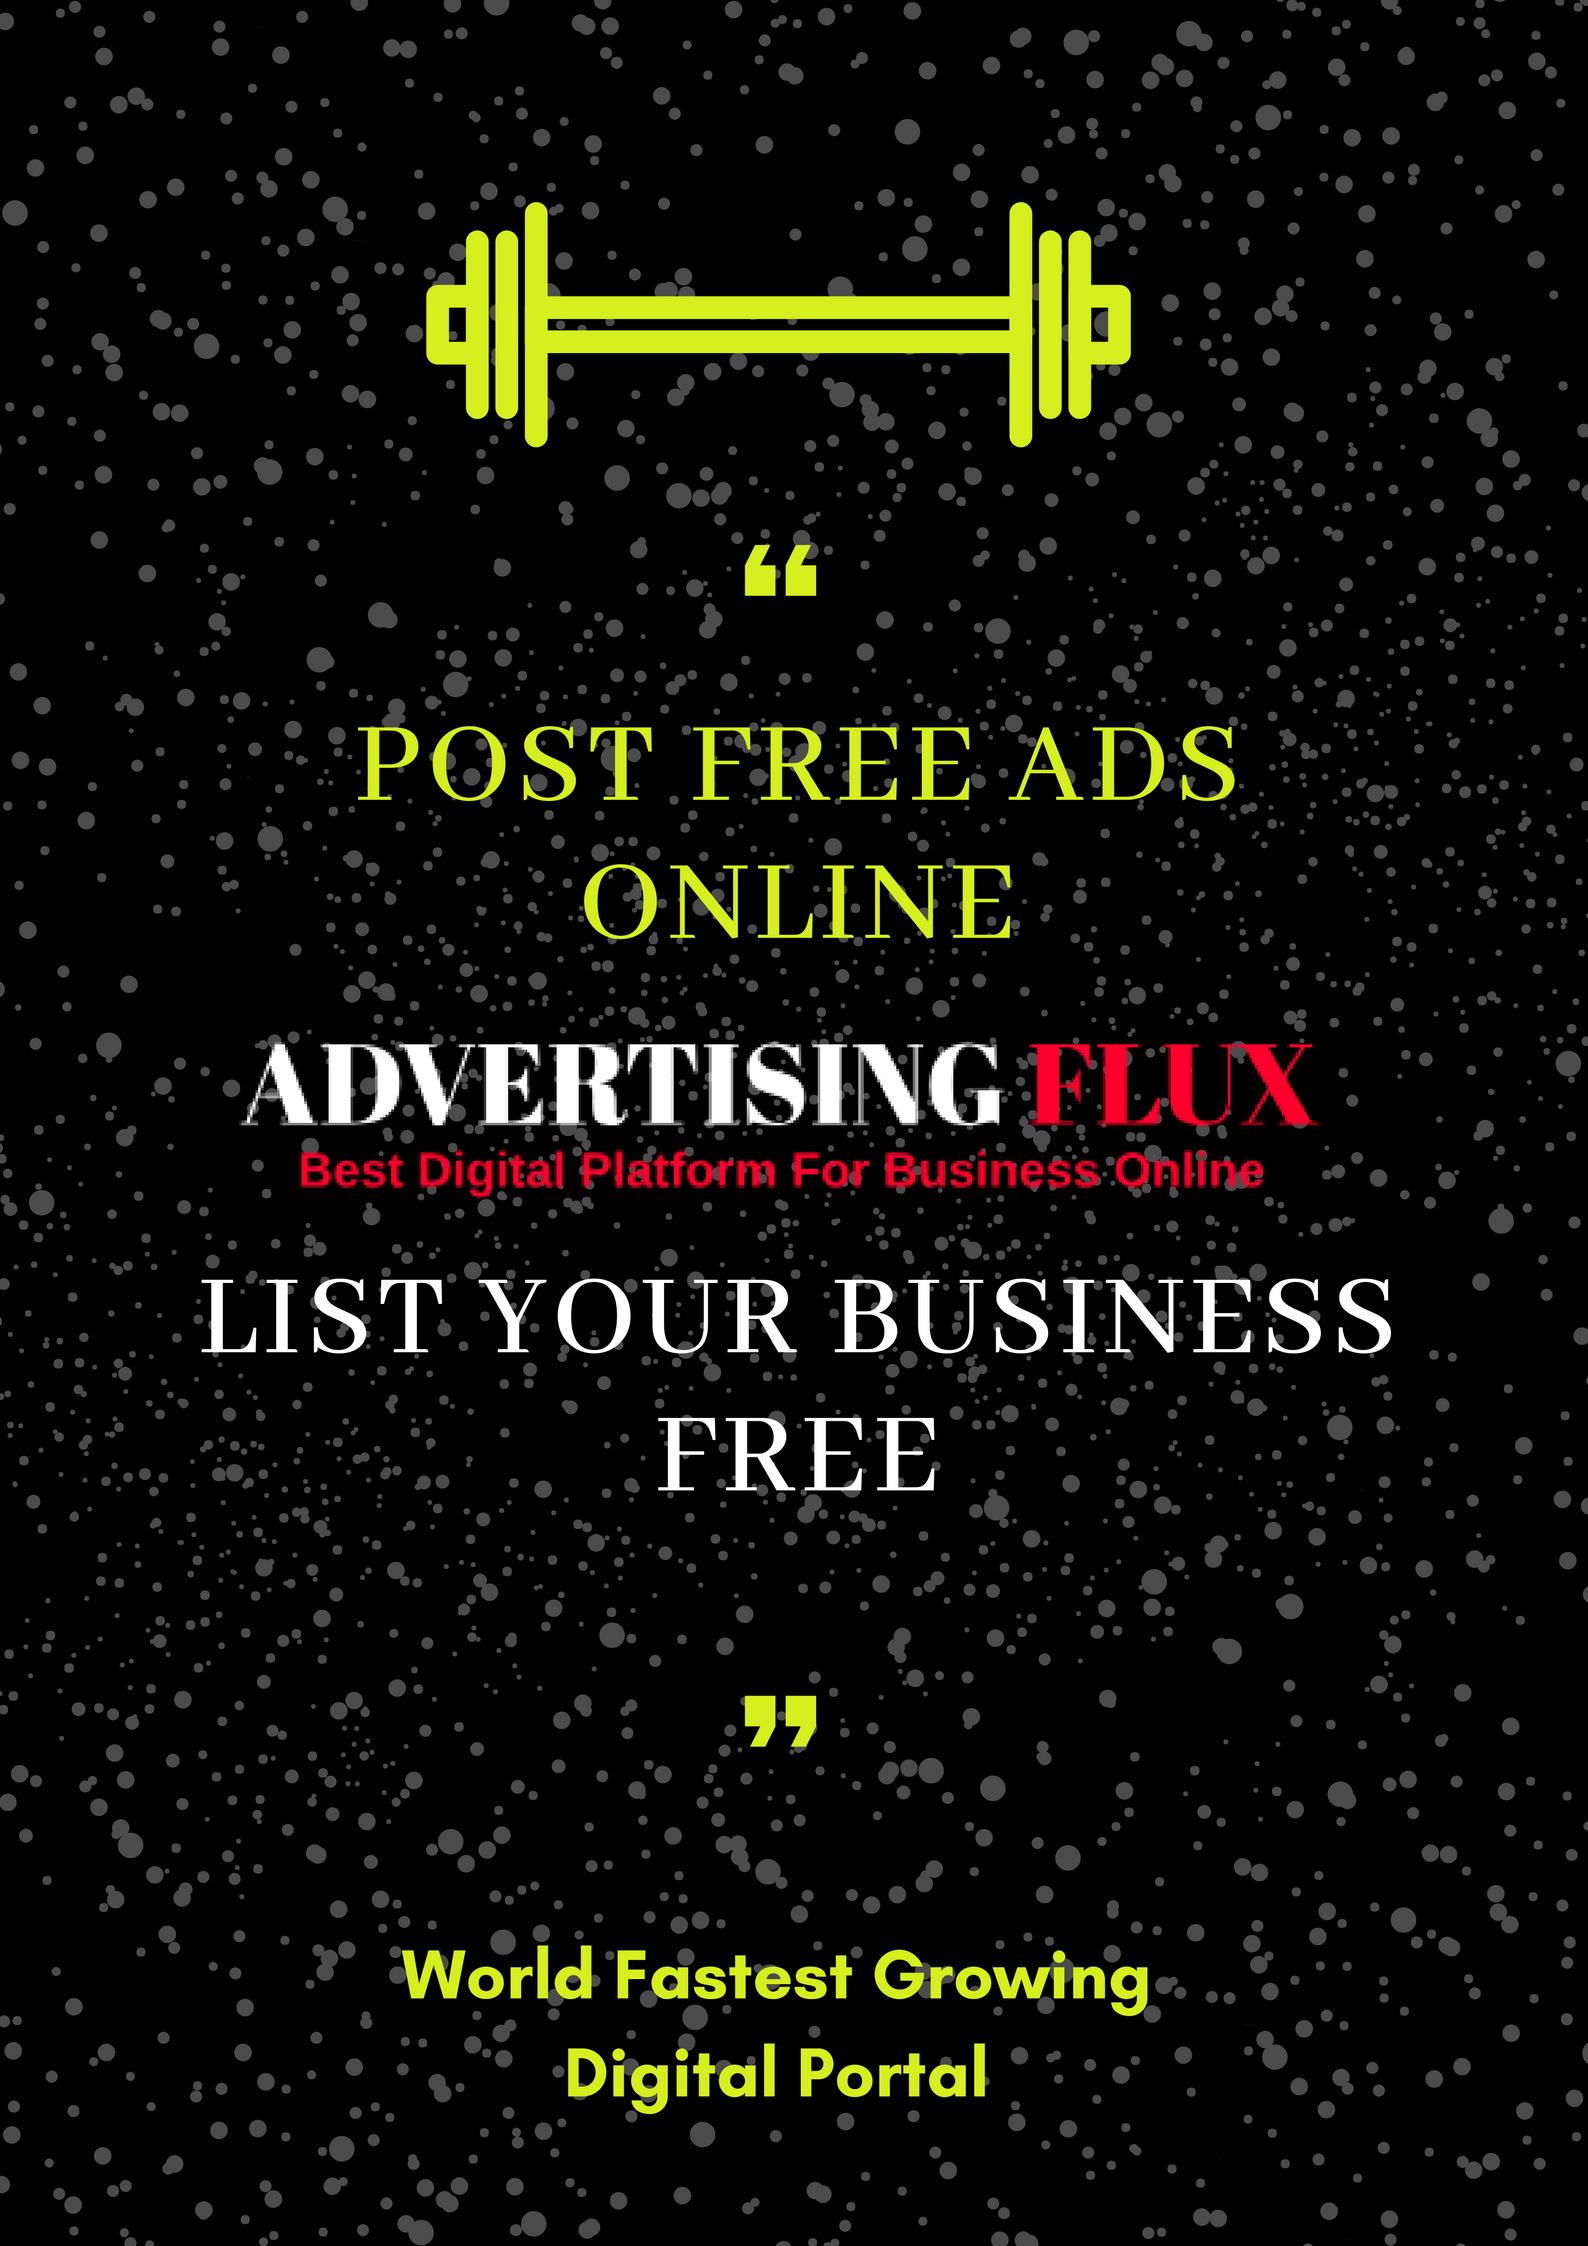 Advertising Flux is the popular online platform for post